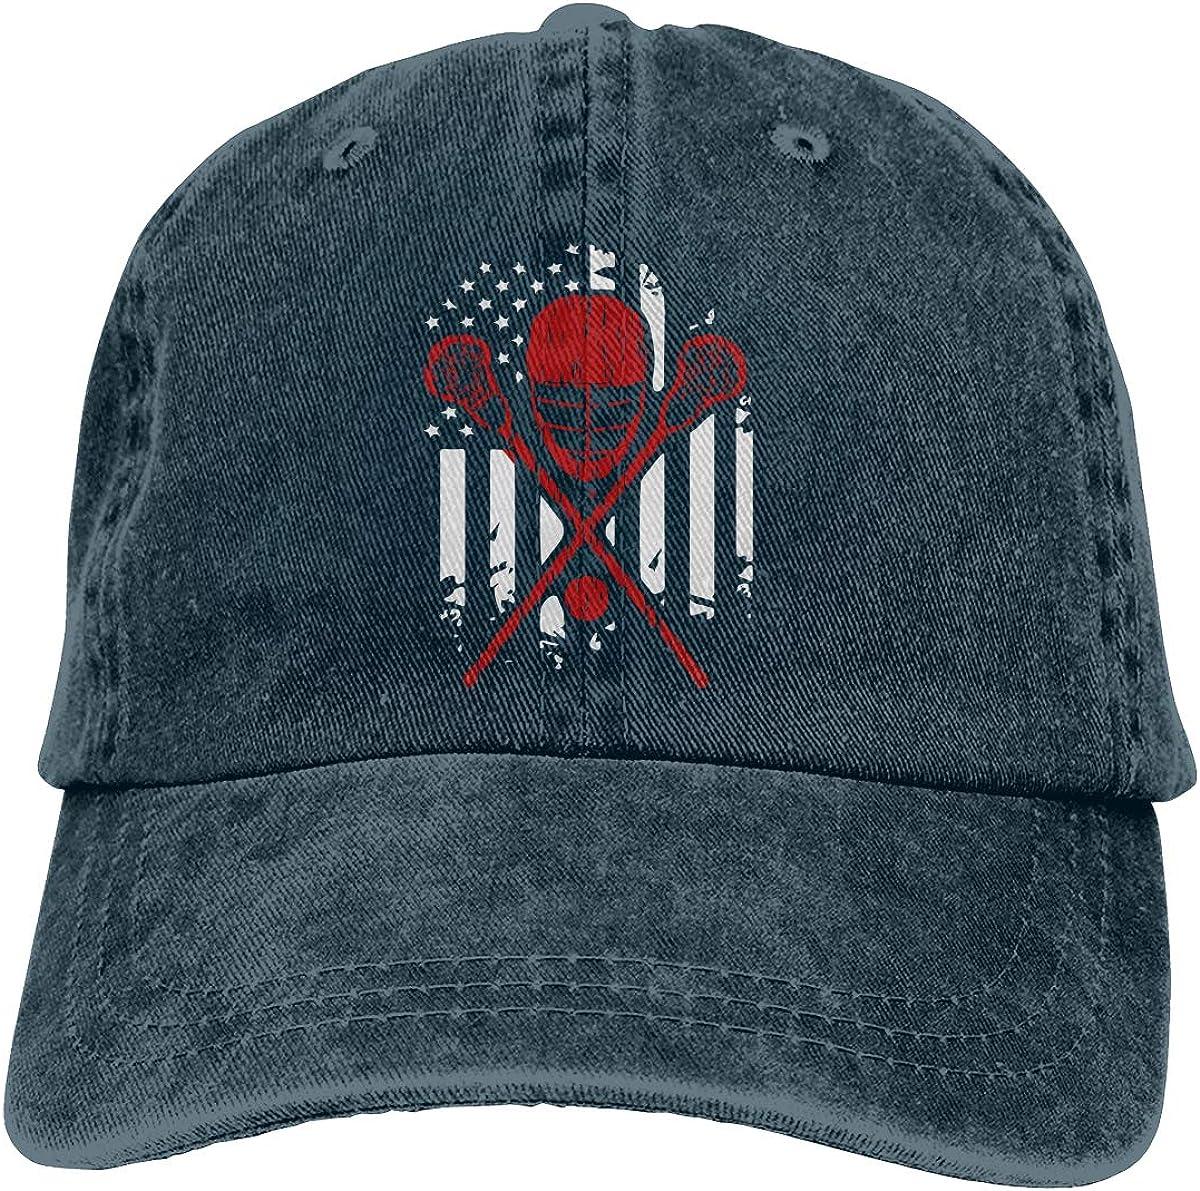 Lacrosse American Flag Adult Custom Cowboy Outdoor Sports Hat Adjustable Baseball Cap